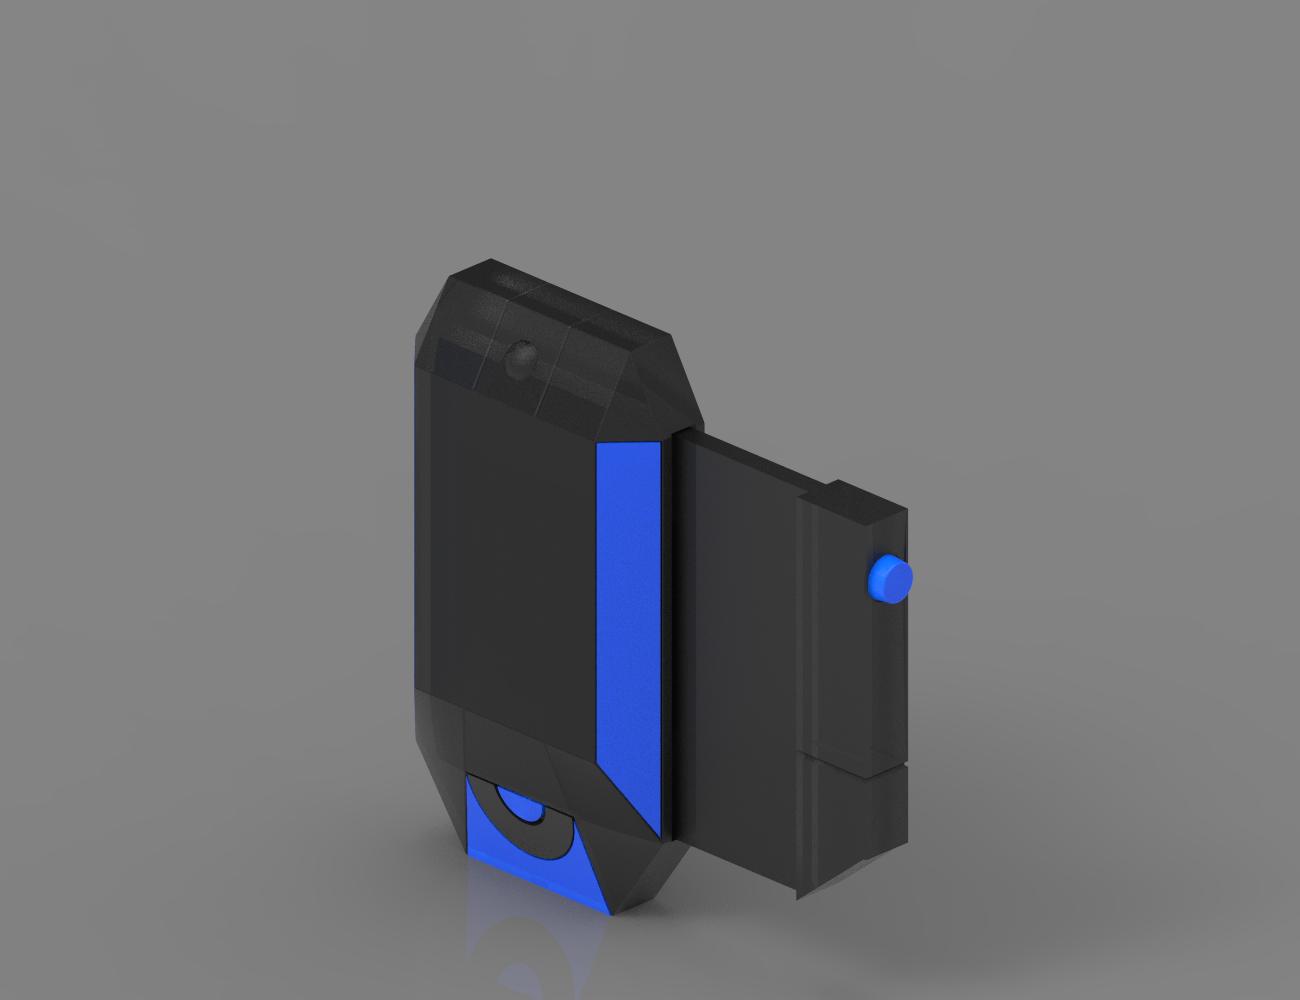 render_scene.15.png Download STL file Pokemon Xtransceiver 3D print model • 3D print model, 3D-mon